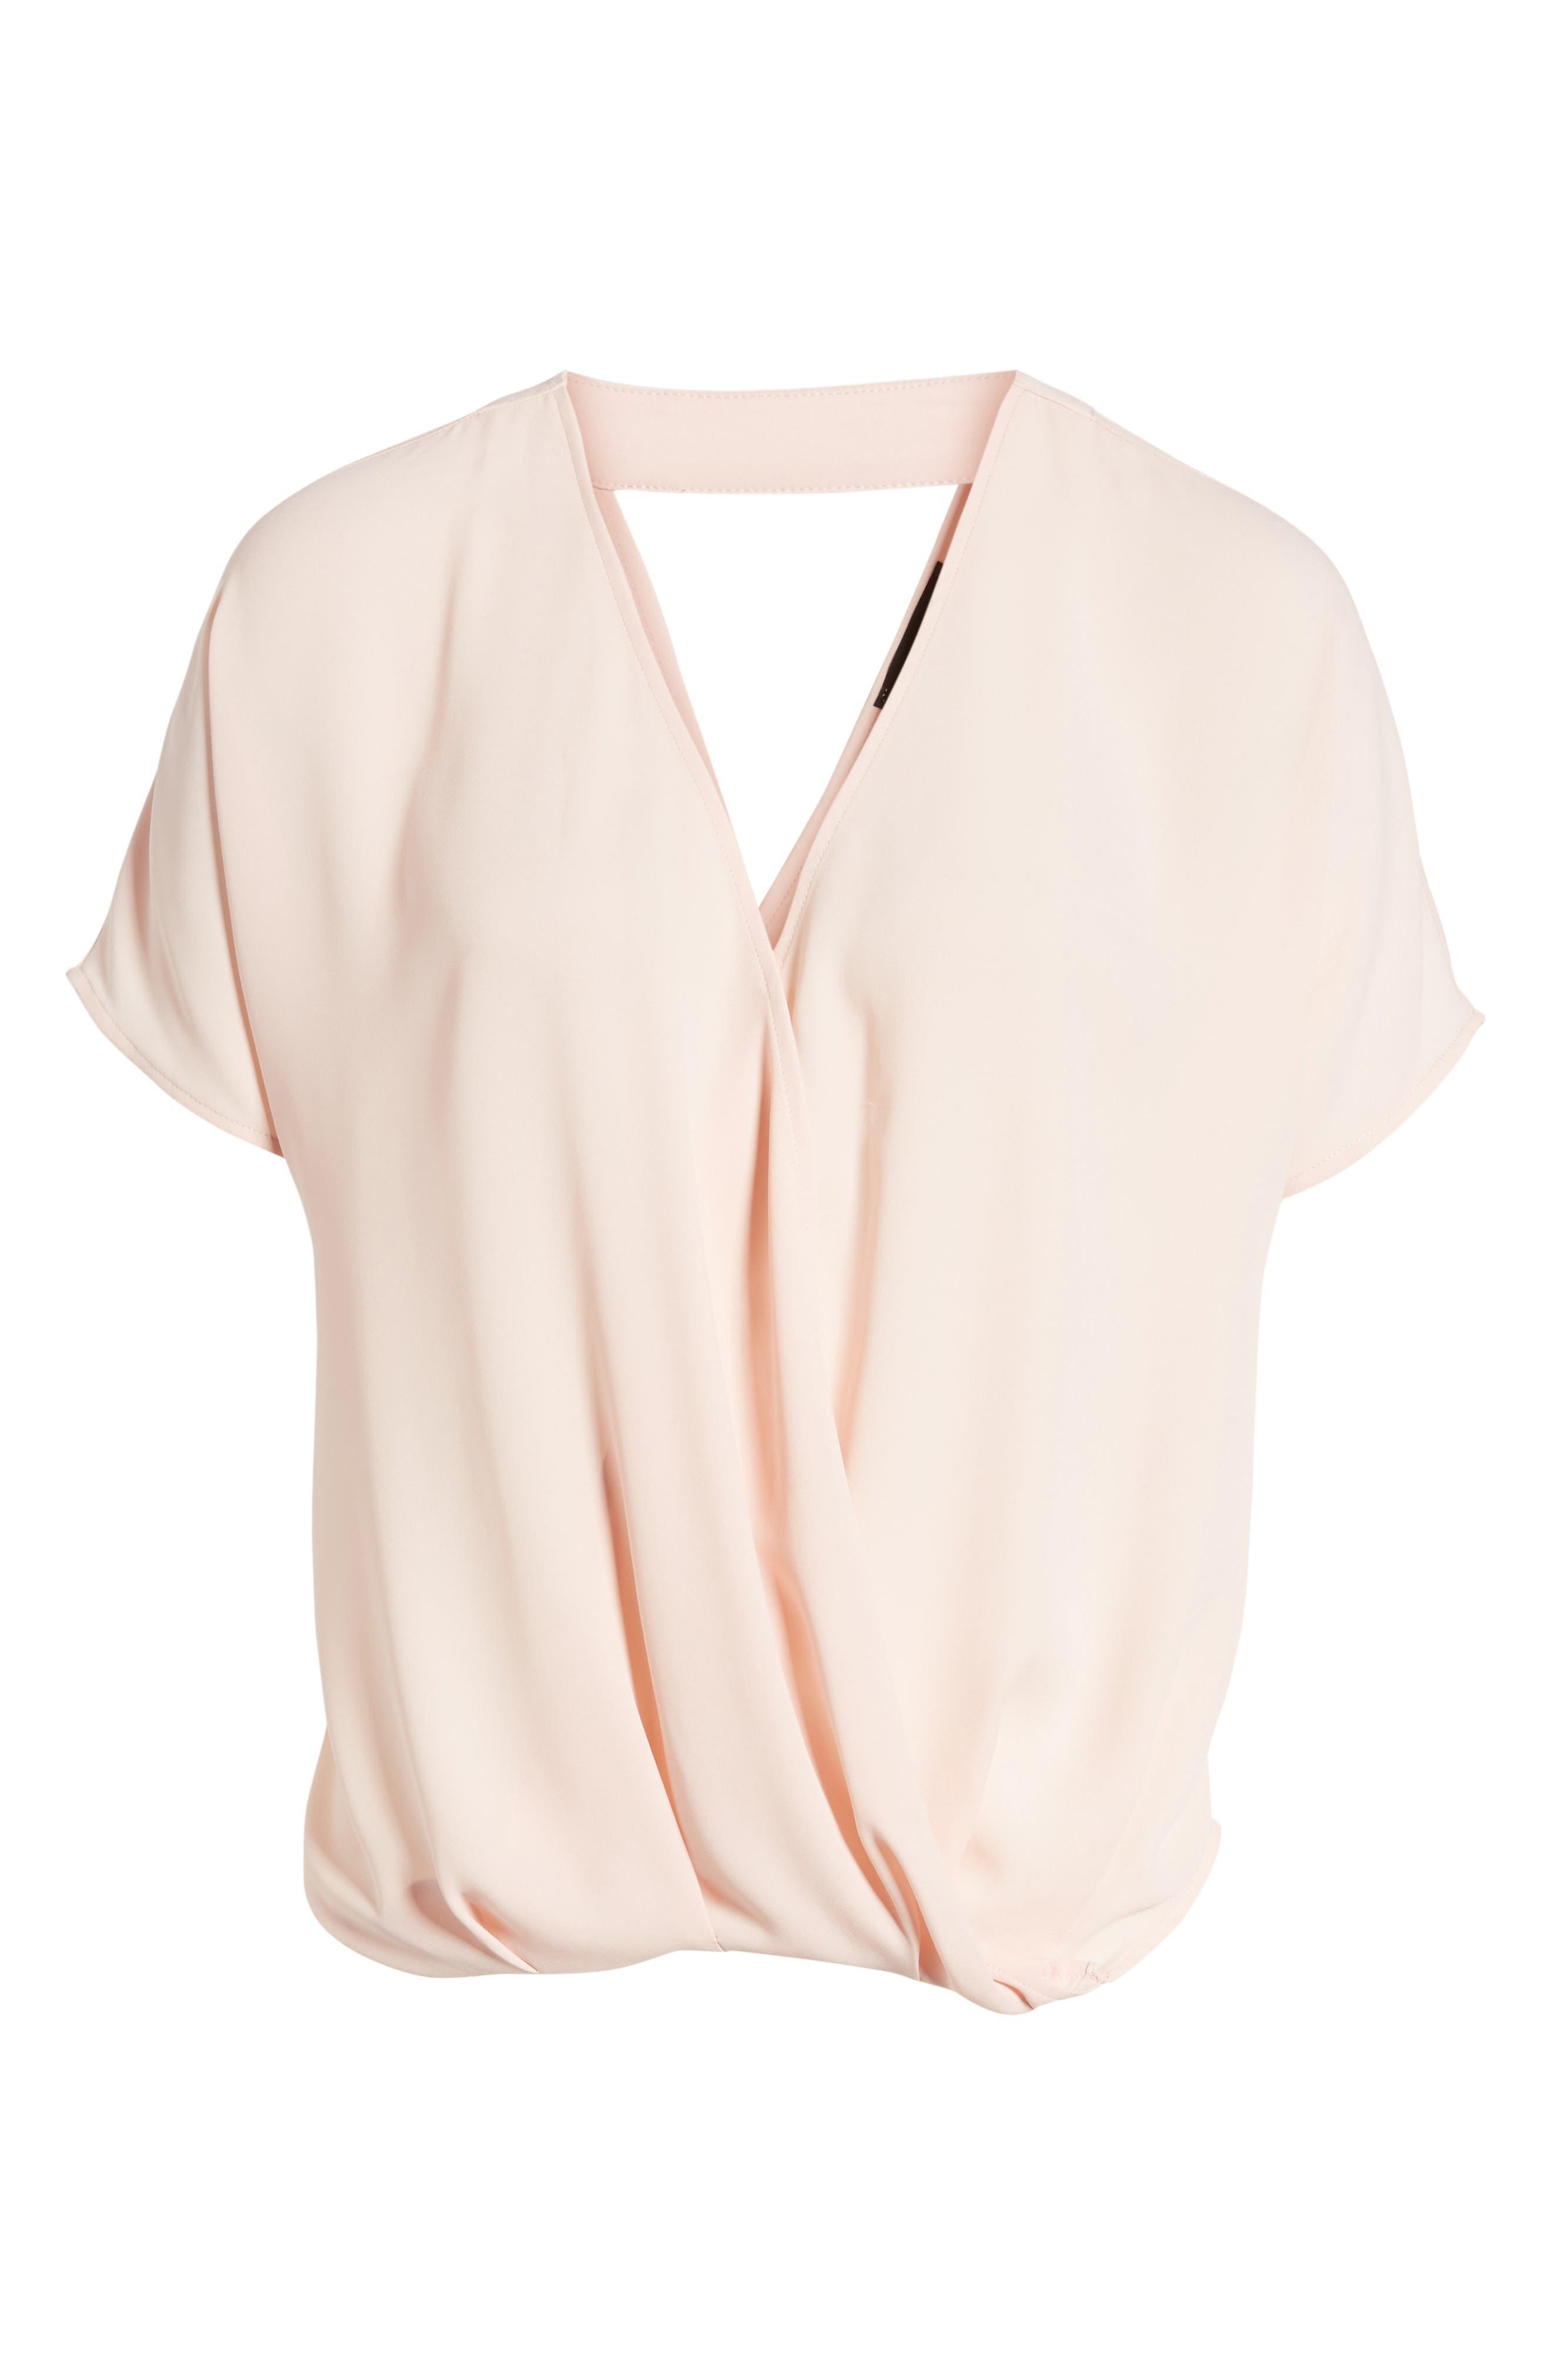 Surplice Top,                             Alternate thumbnail 6, color,                             Pink Peach